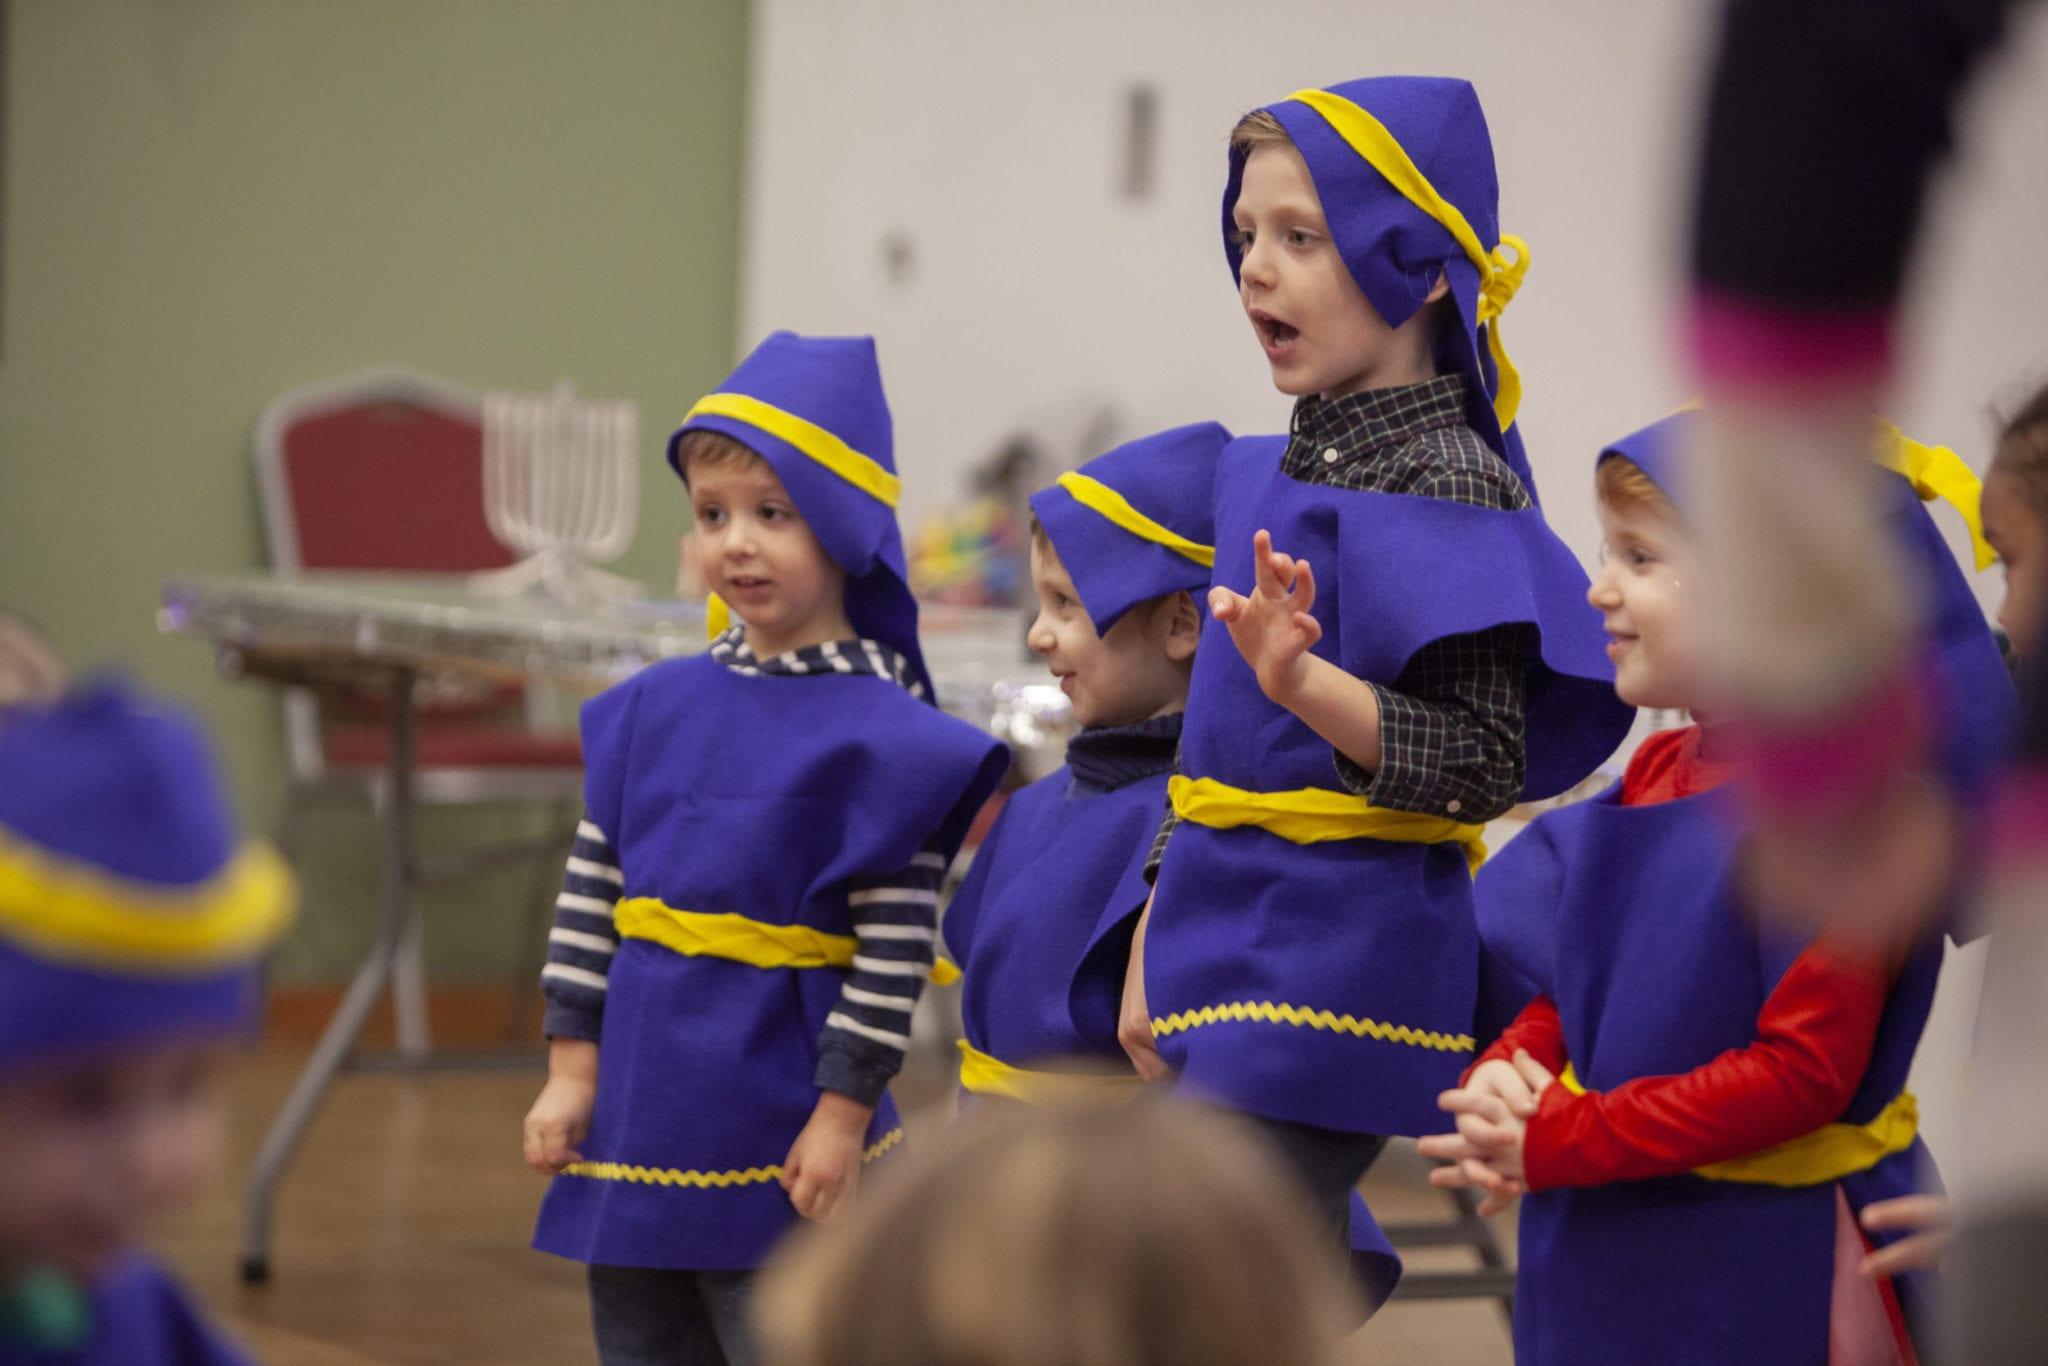 Children from the Gan-Garrett Jewish Preschool perform classic Hanukkah tunes dressed as Maccabees for their families at their Hanukkah festival on Dec. 9. Photo by Jacob Granneman